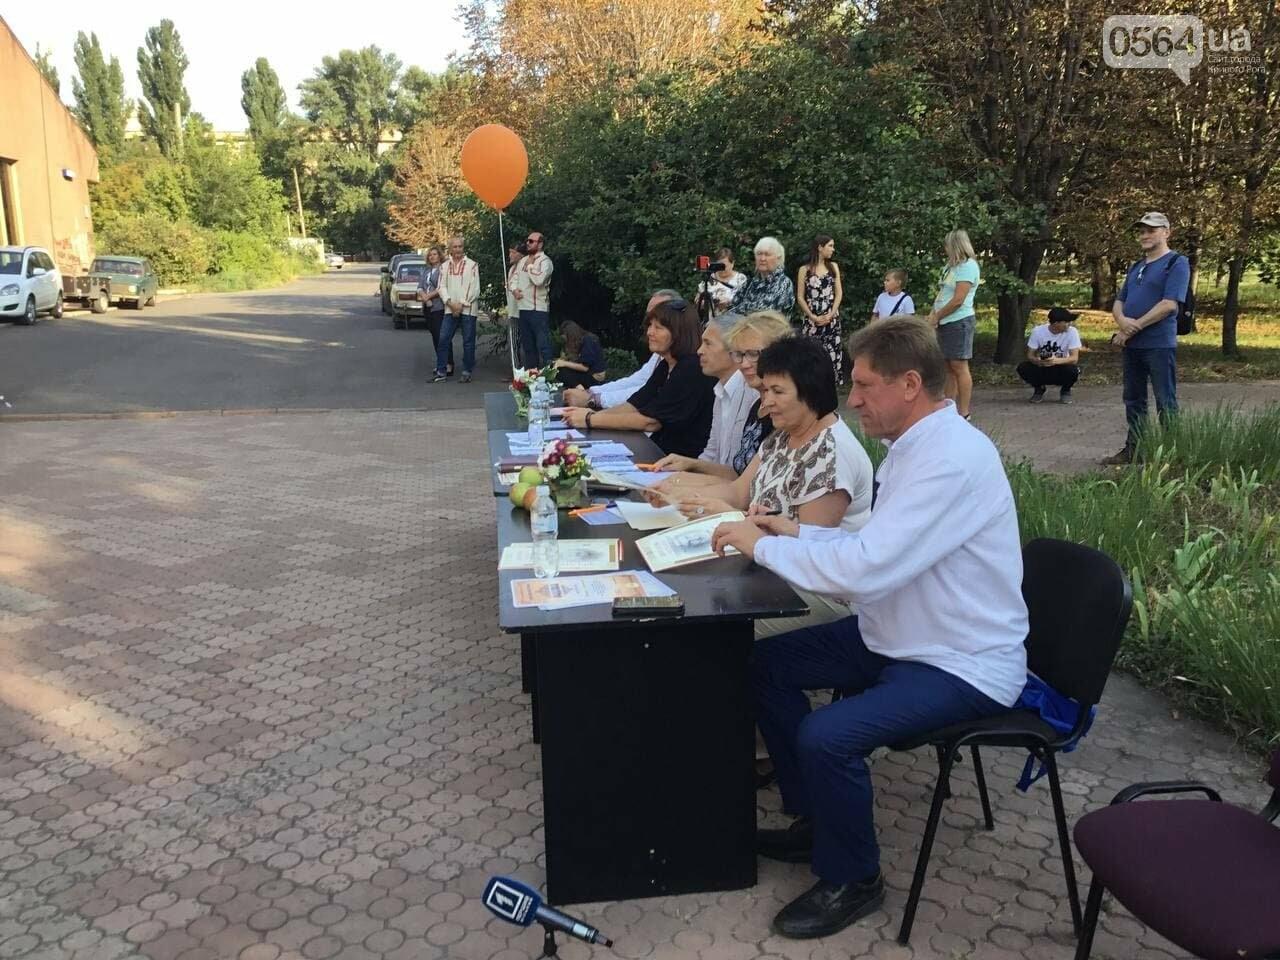 18 конкурсантов представили своё творчество на 5-м Криворожском фестивале имени Кузьмы Скрябина, - ФОТО, ВИДЕО, фото-2